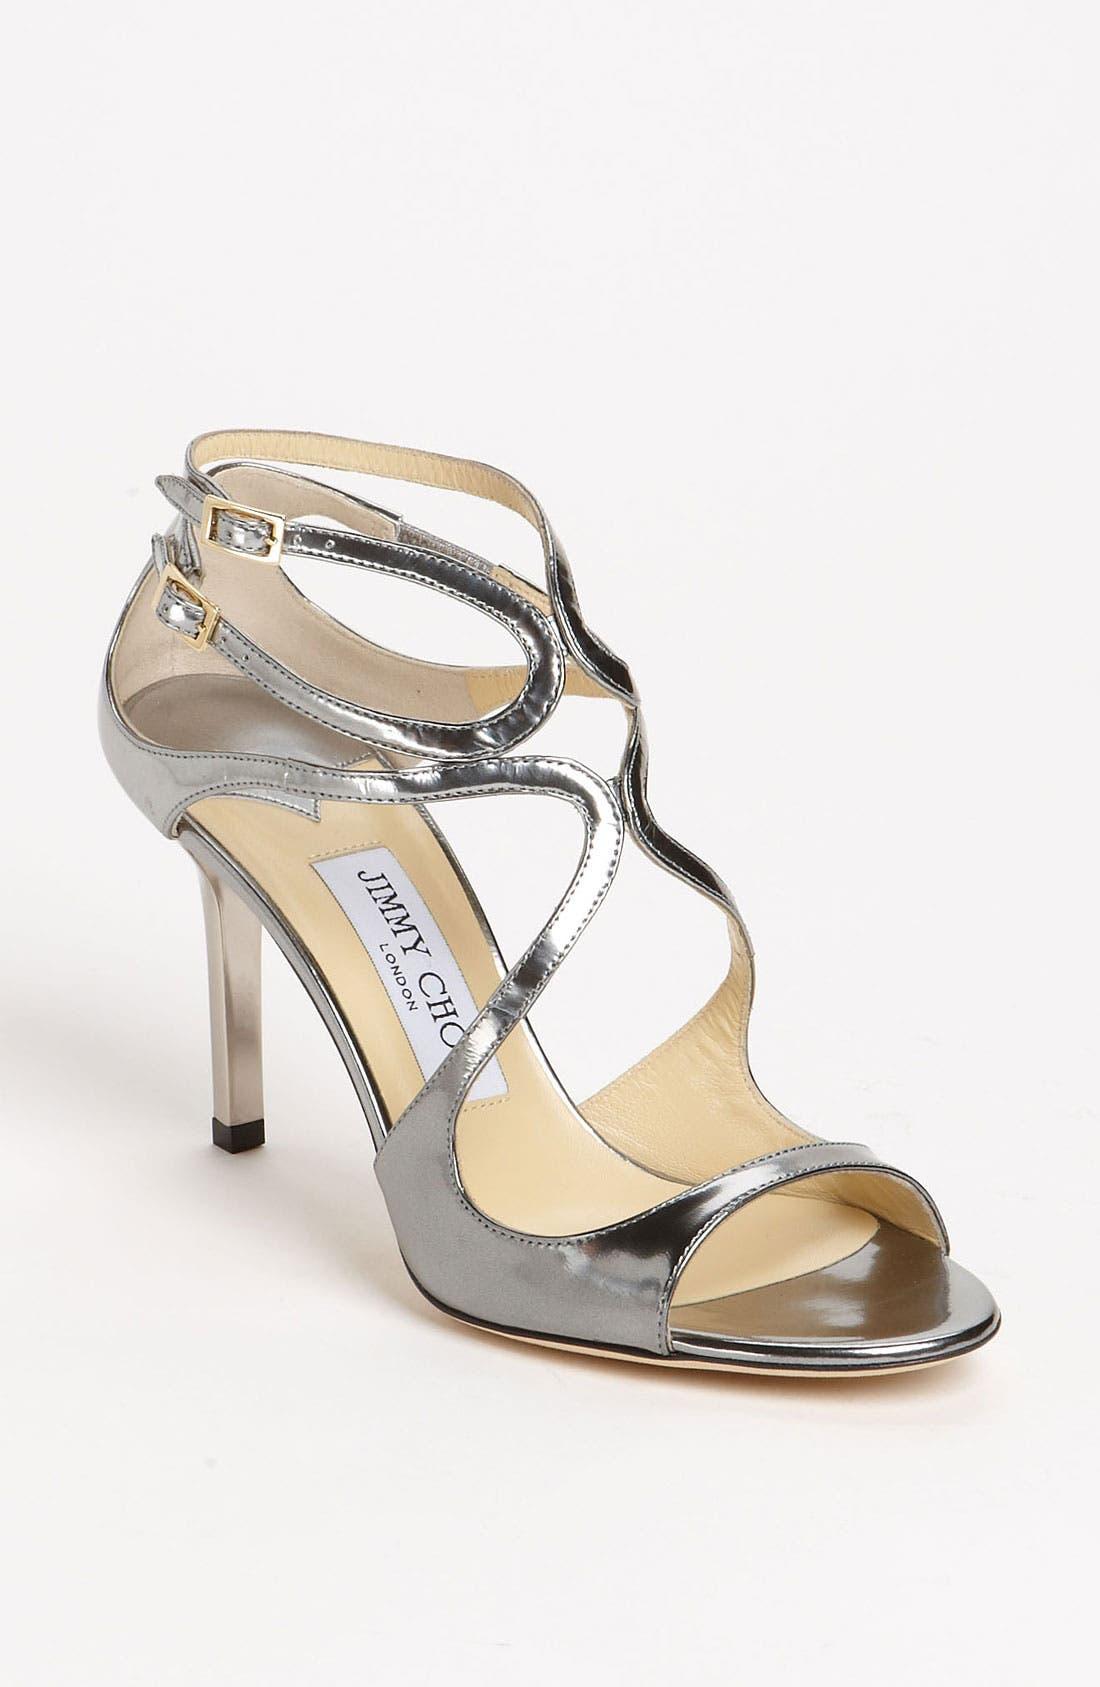 Alternate Image 1 Selected - Jimmy Choo 'Ivette' Strap Sandal